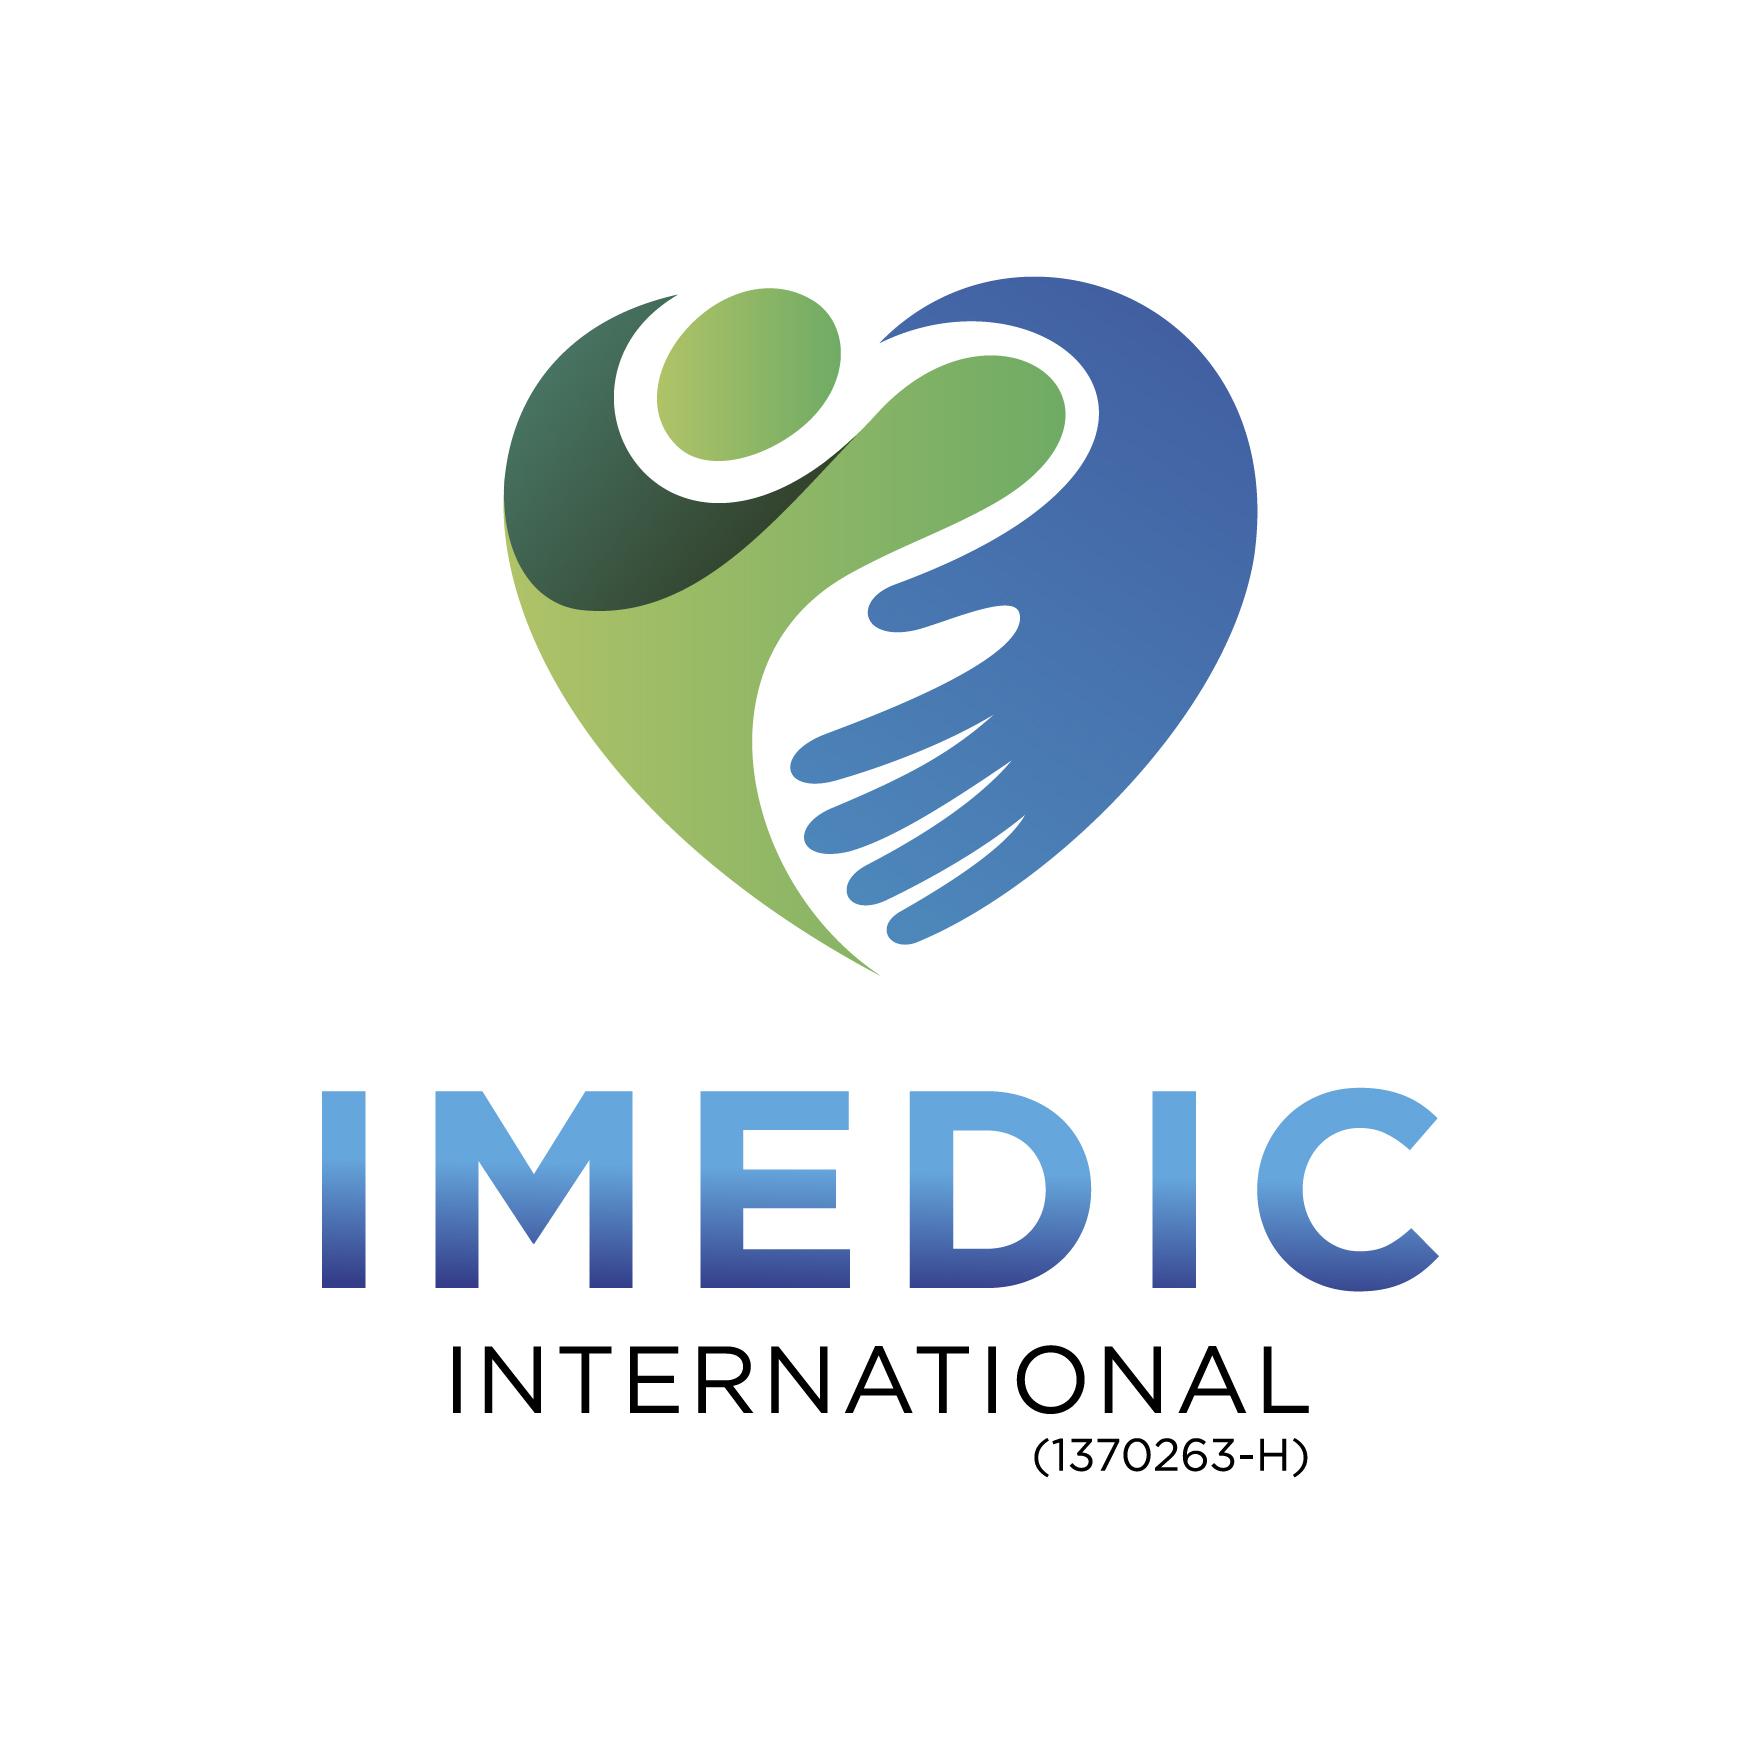 Imedic International Product Catalogue